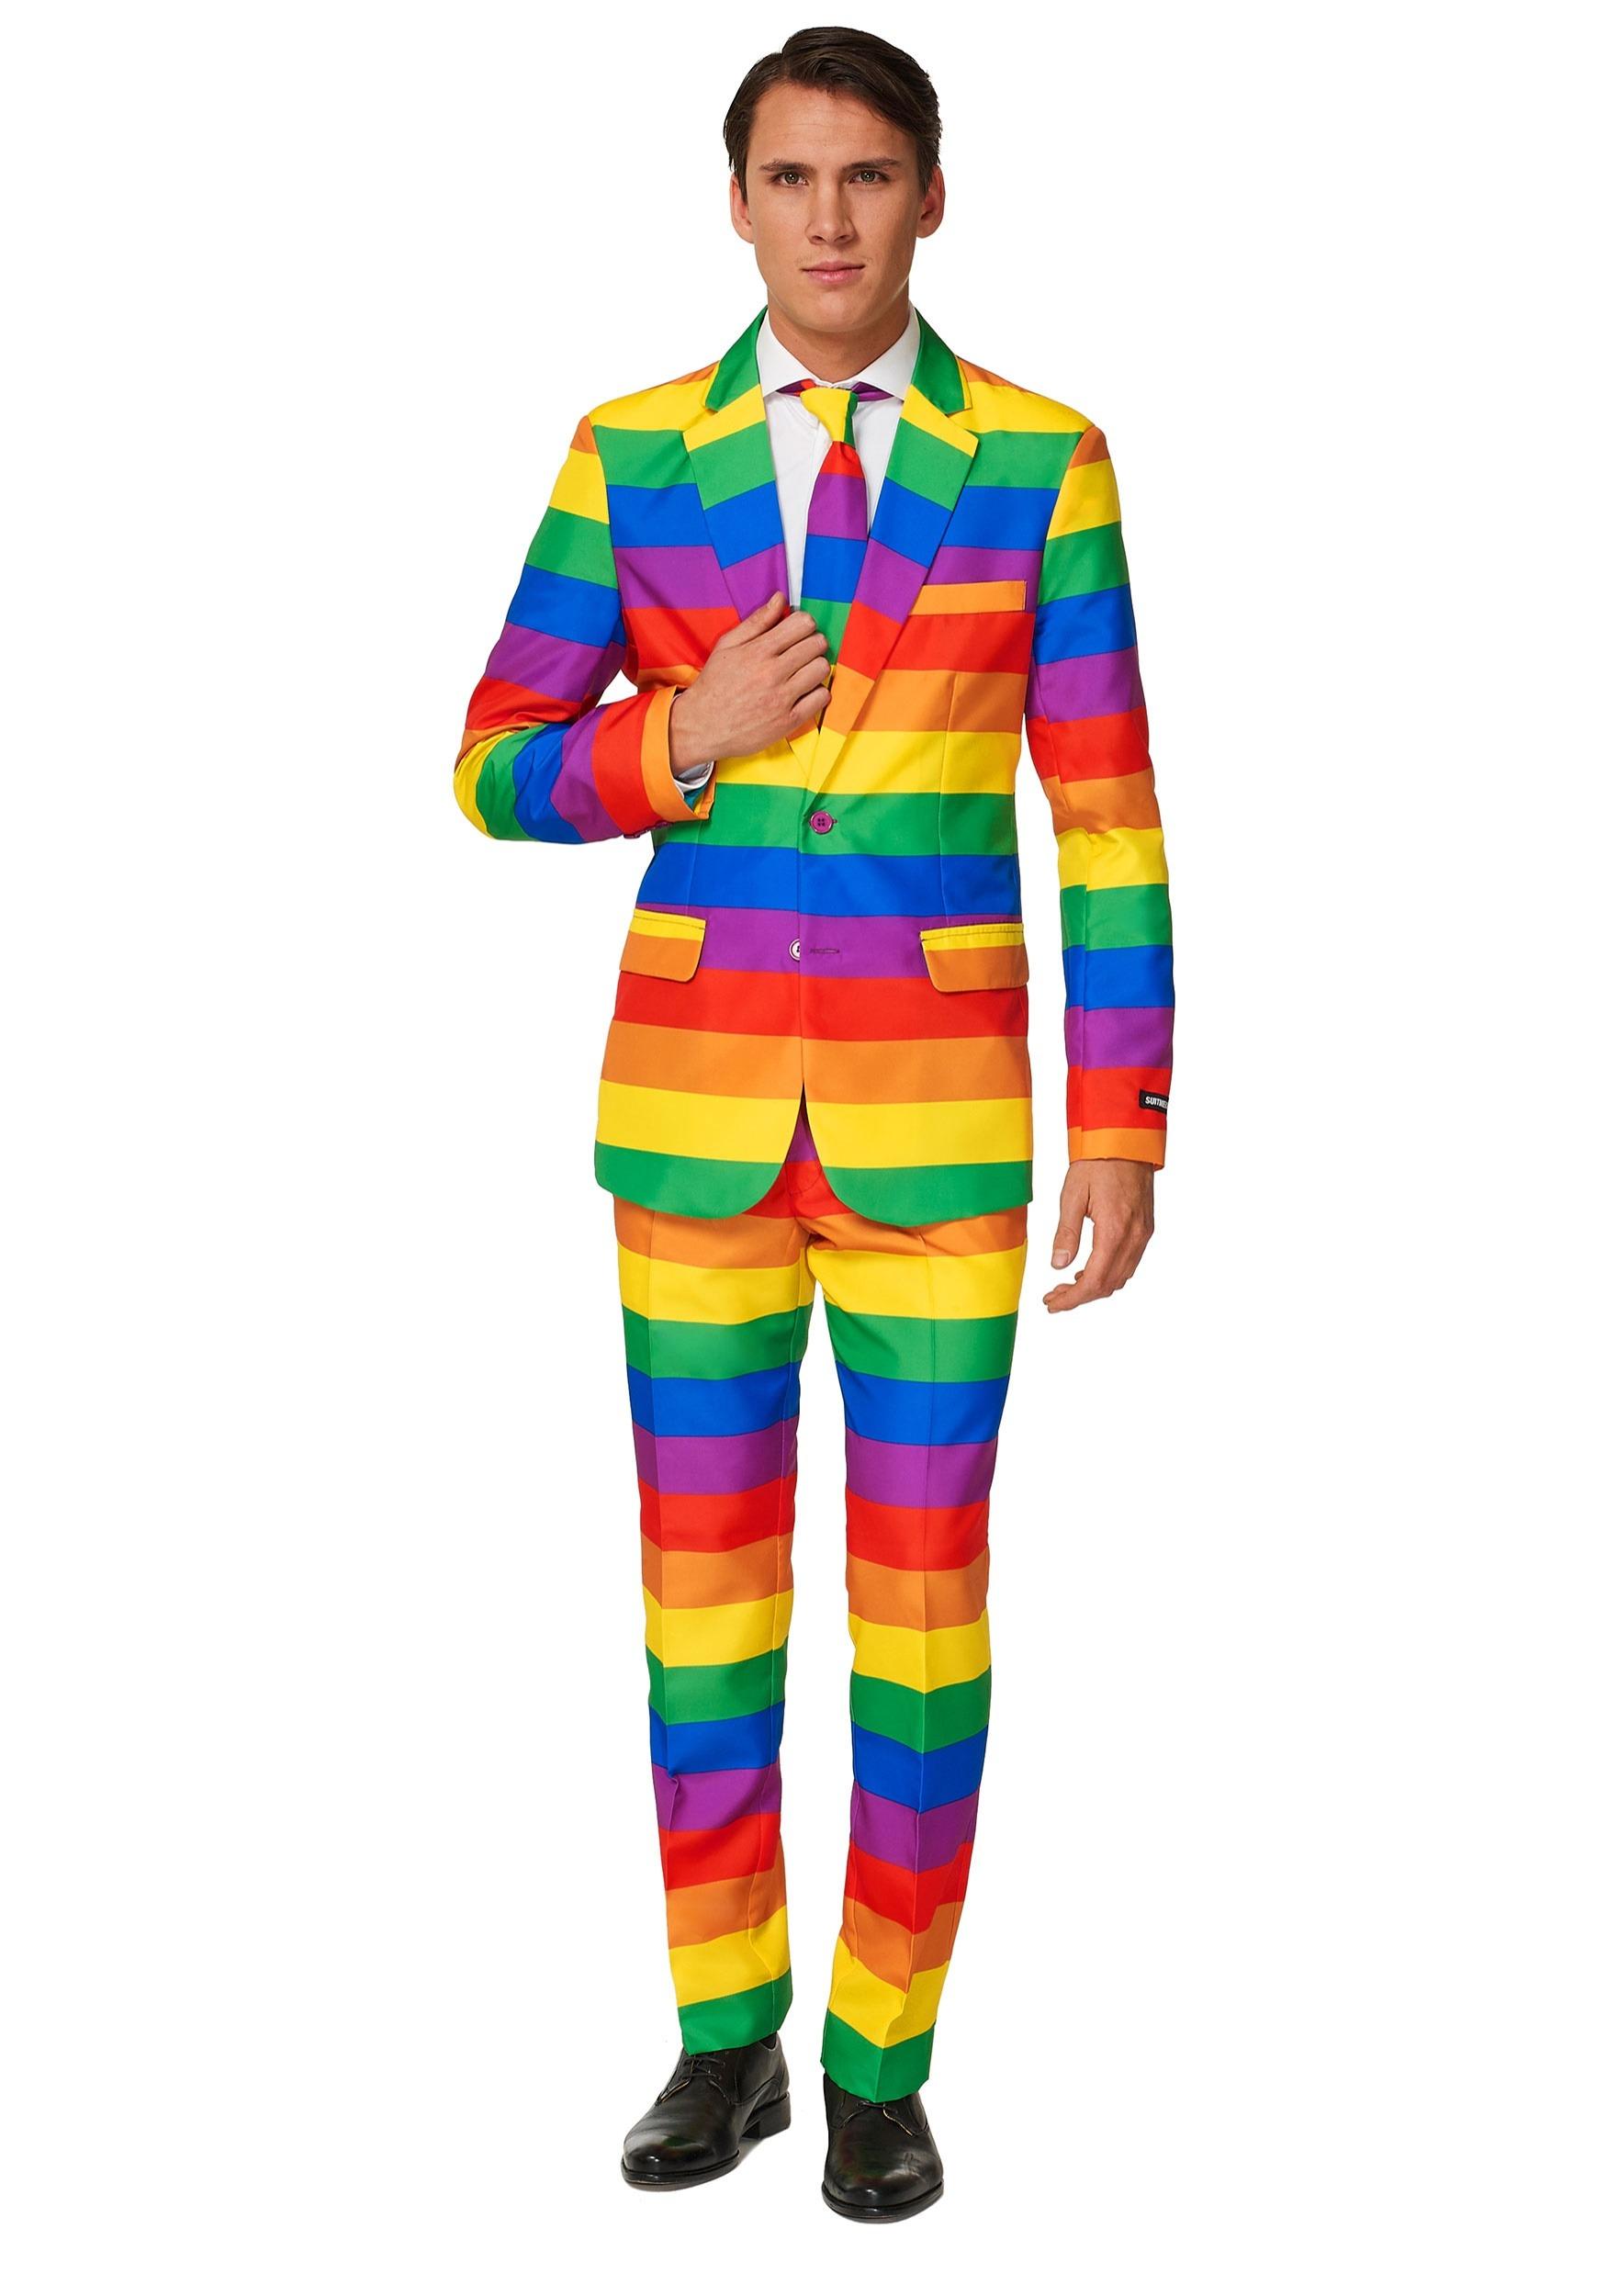 Men's Rainbow Suitmeister Suit Costume